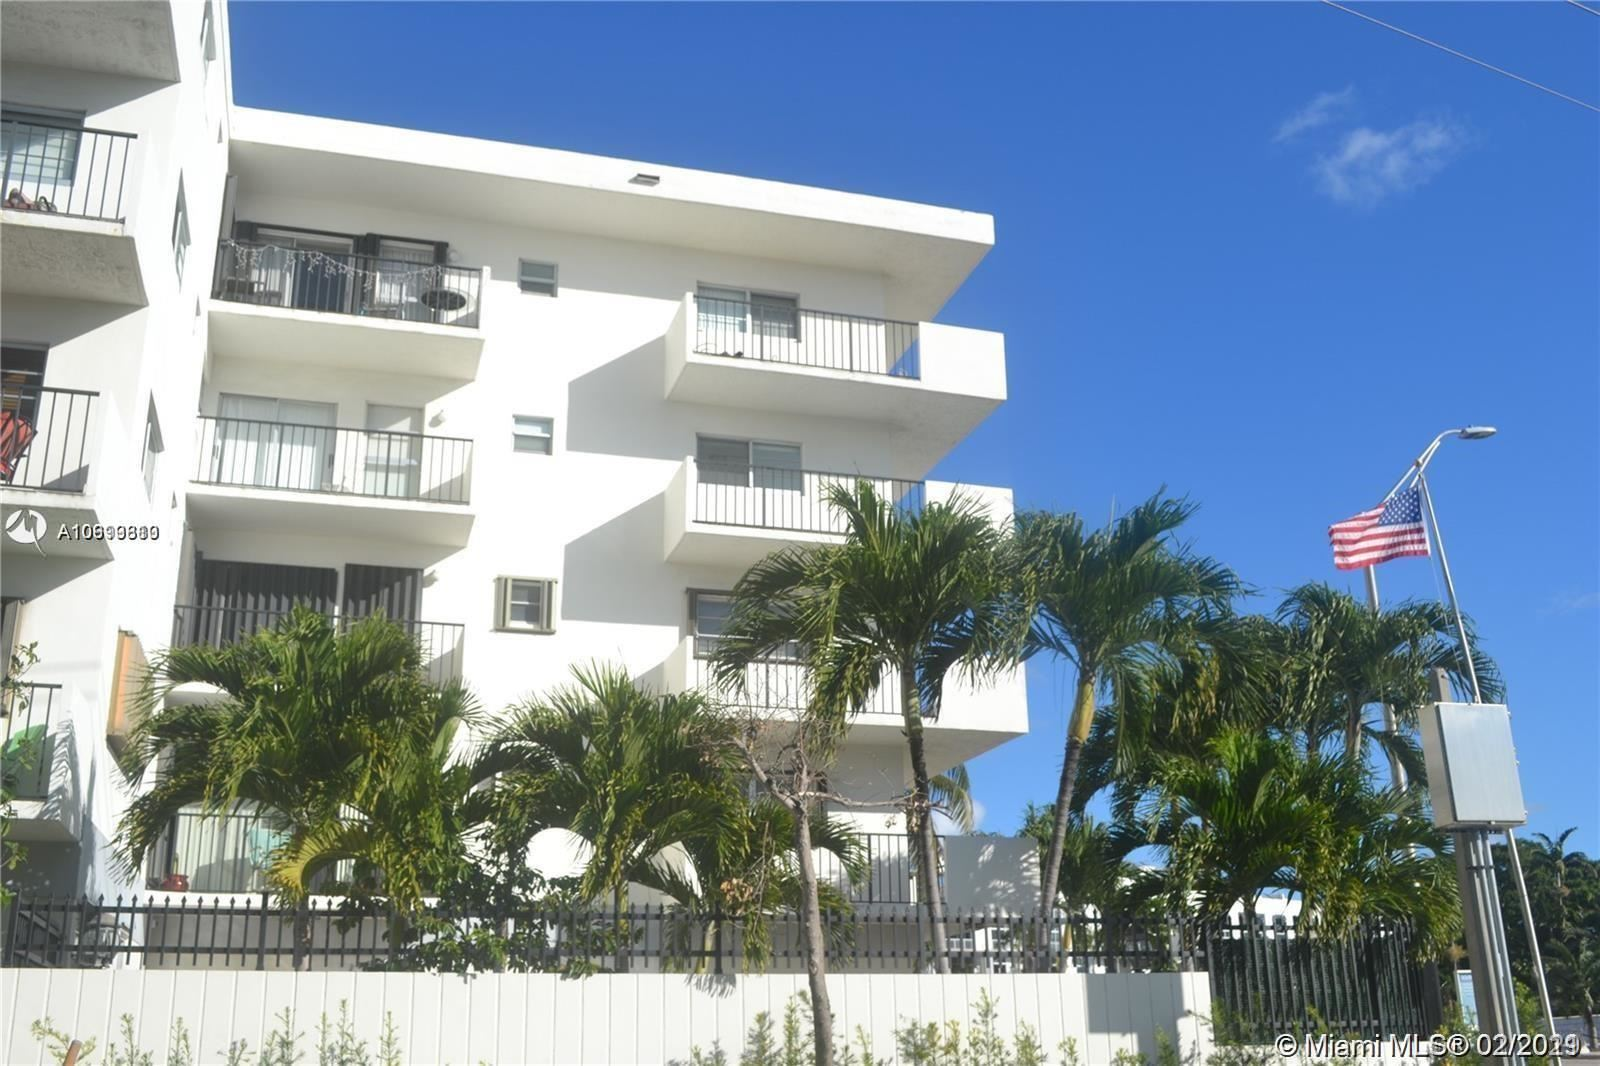 1900 Meridian Ave #203, Miami Beach, FL 33139 - #: A10999810